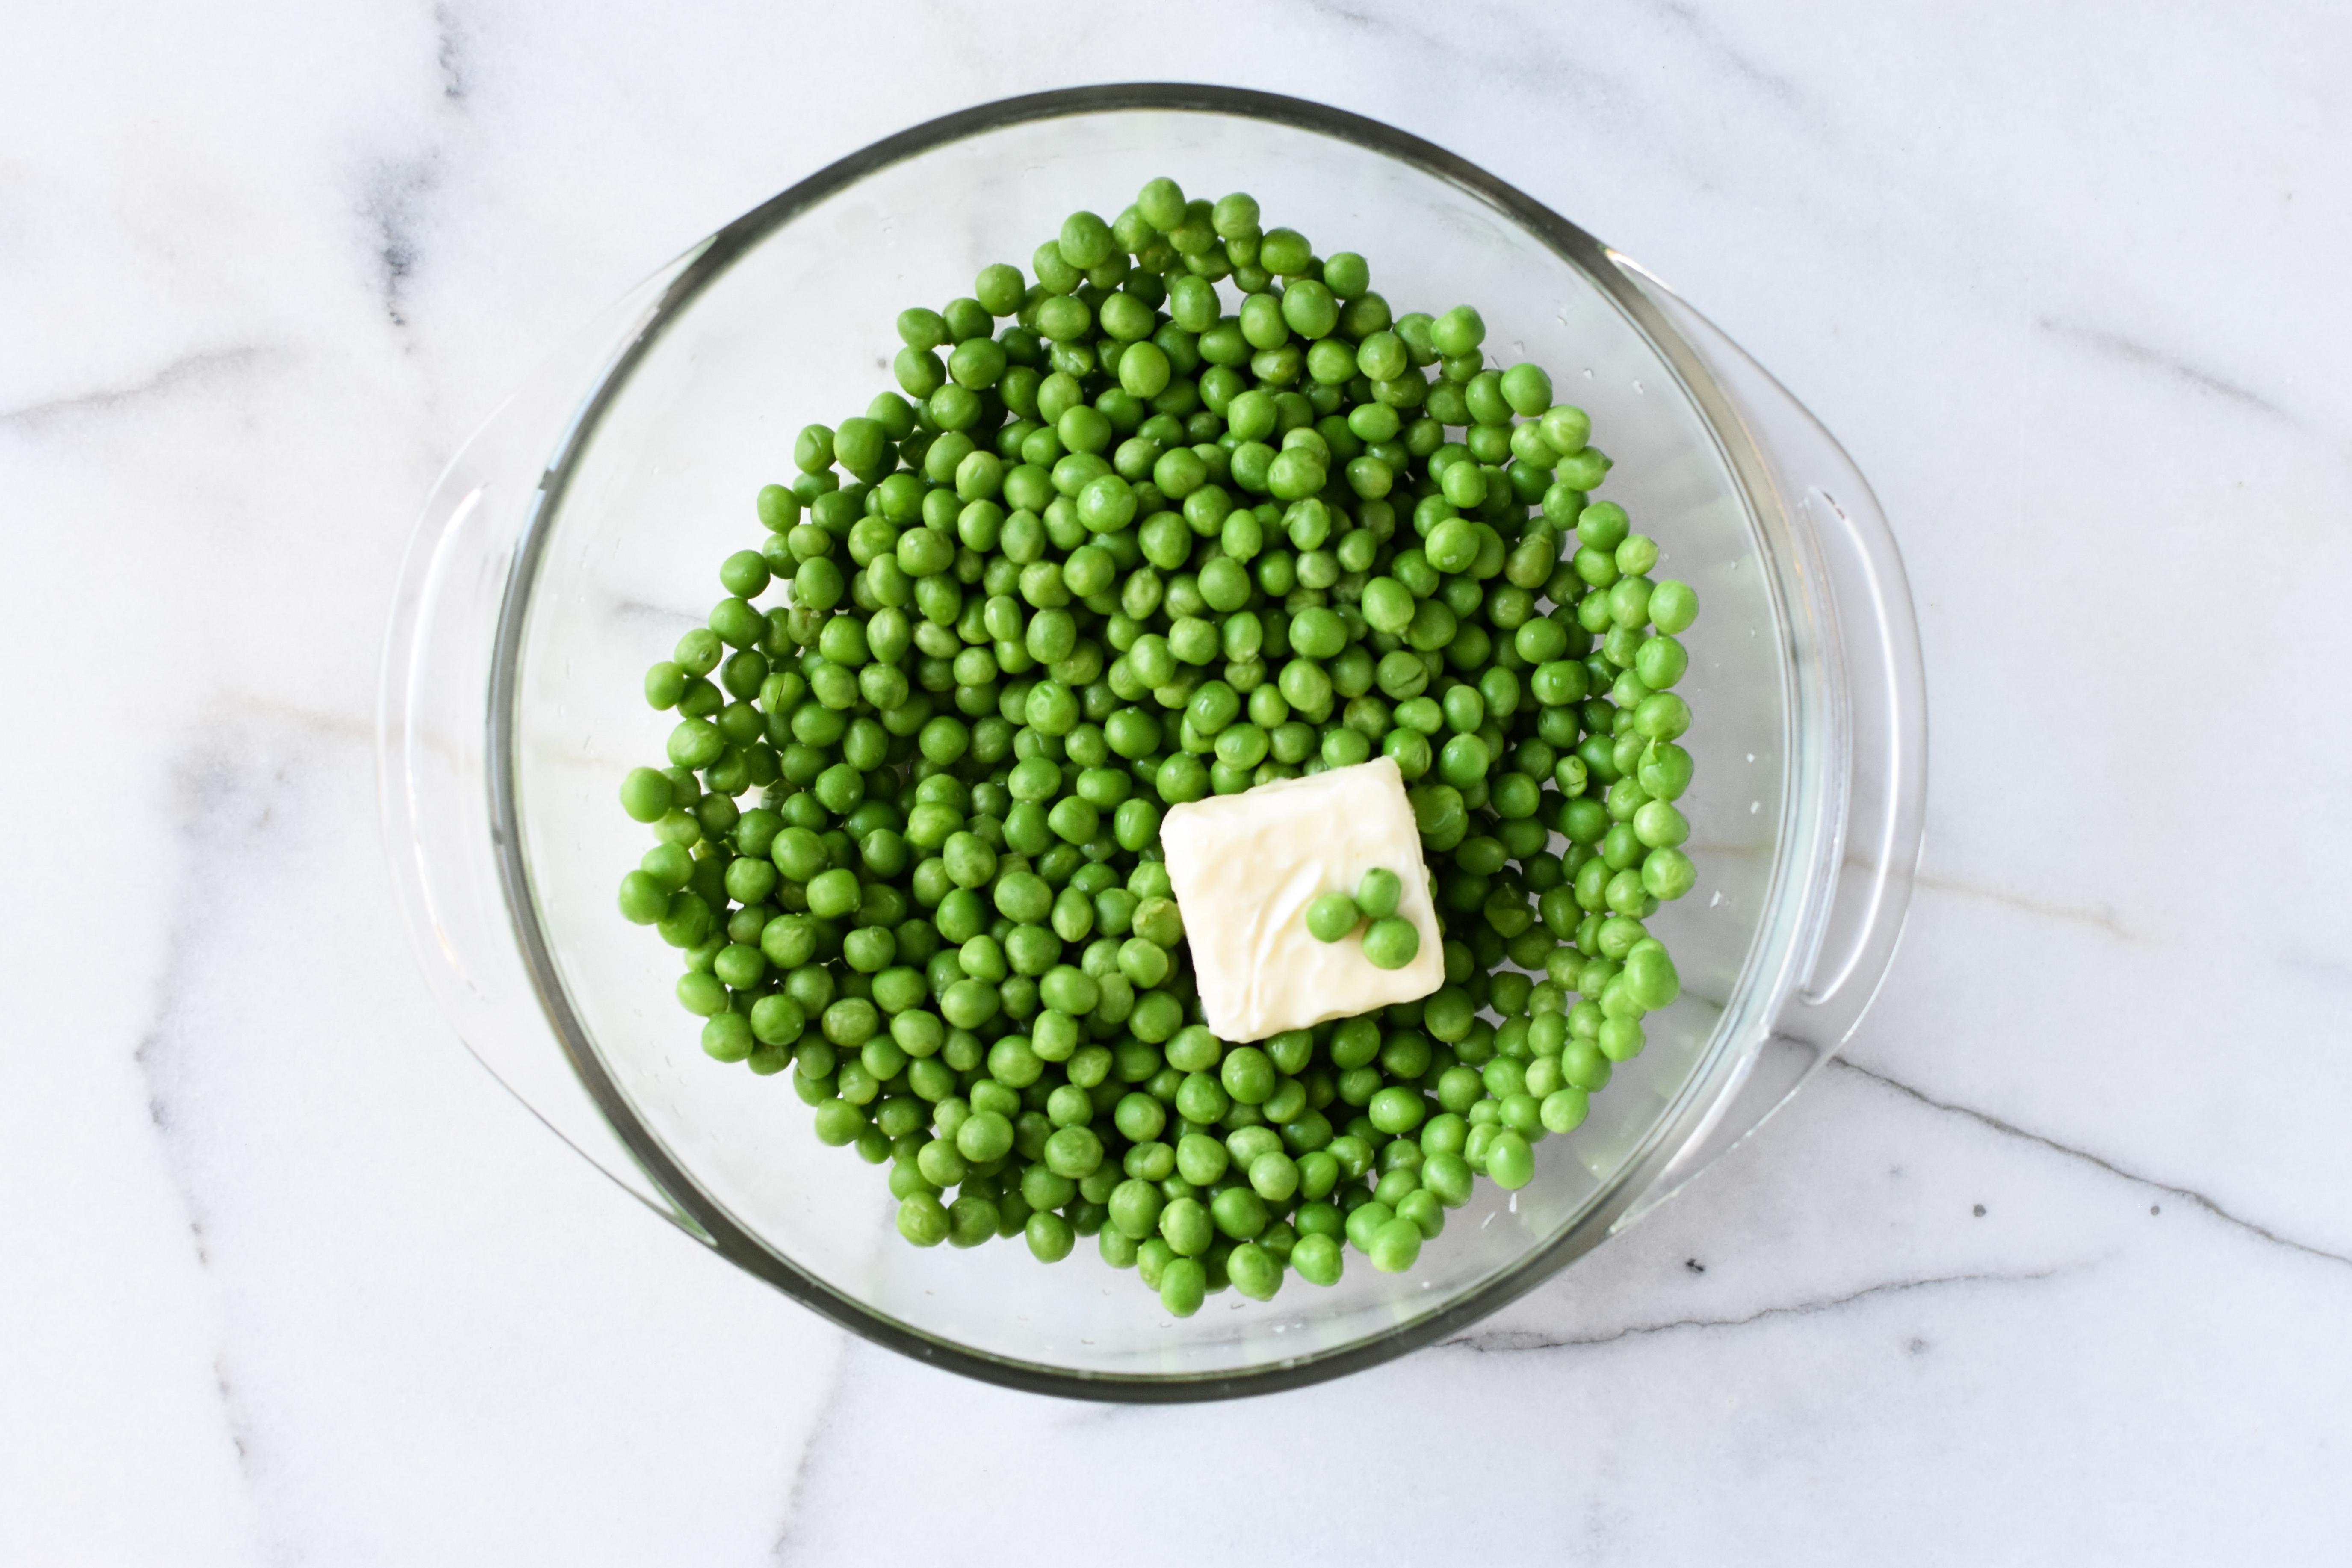 Peas Photos